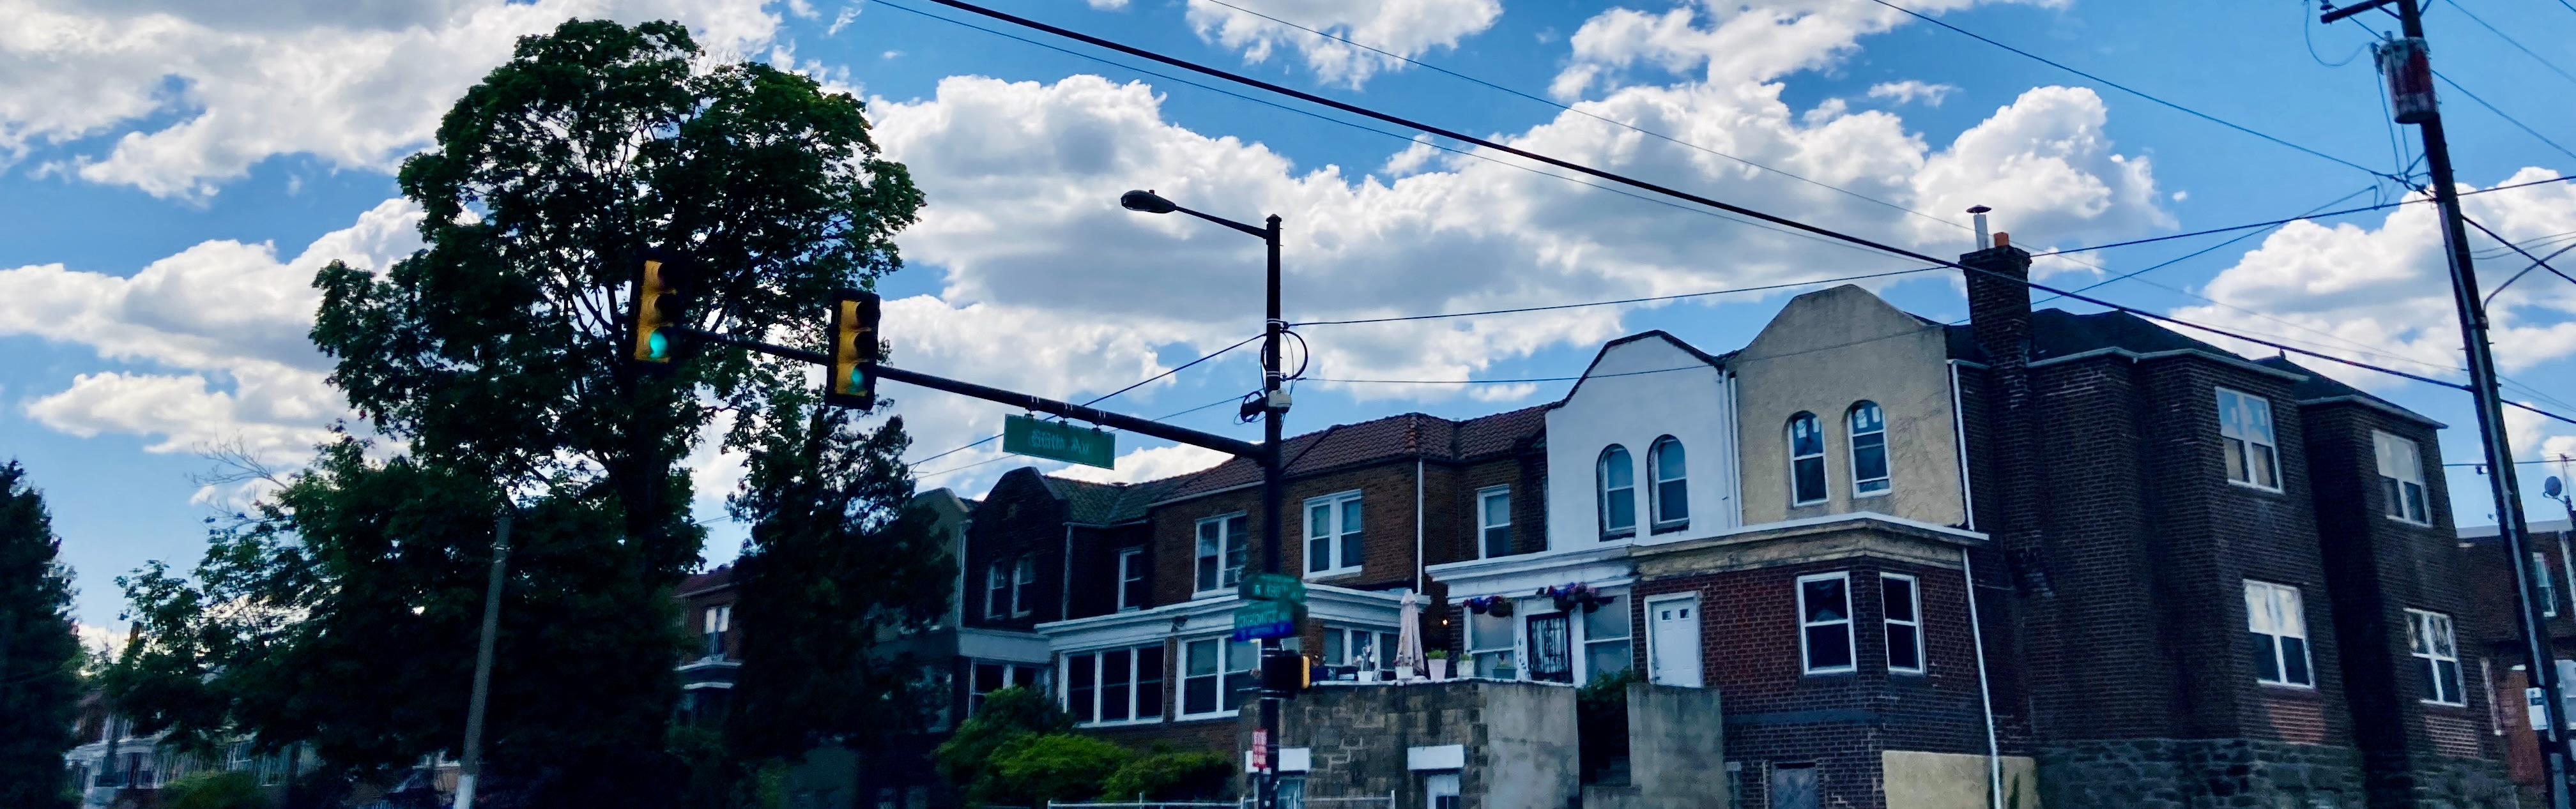 West Oak Lane 66th Ave Townhouses